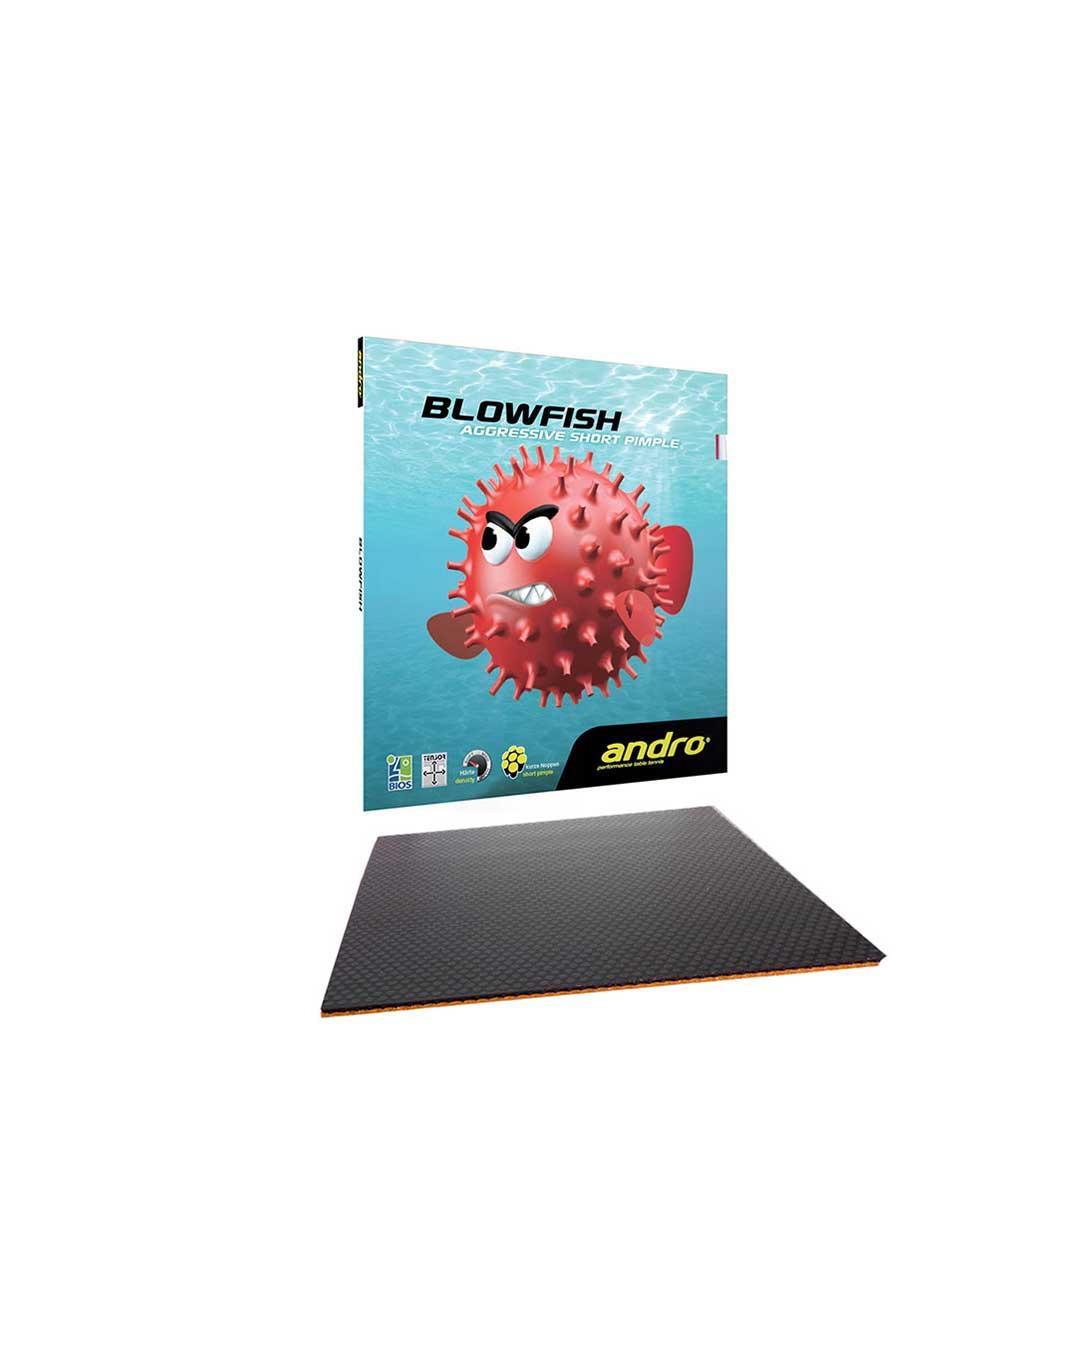 Goma Tenis de Mesa Andro Blowfish Black Max 2.2 mm